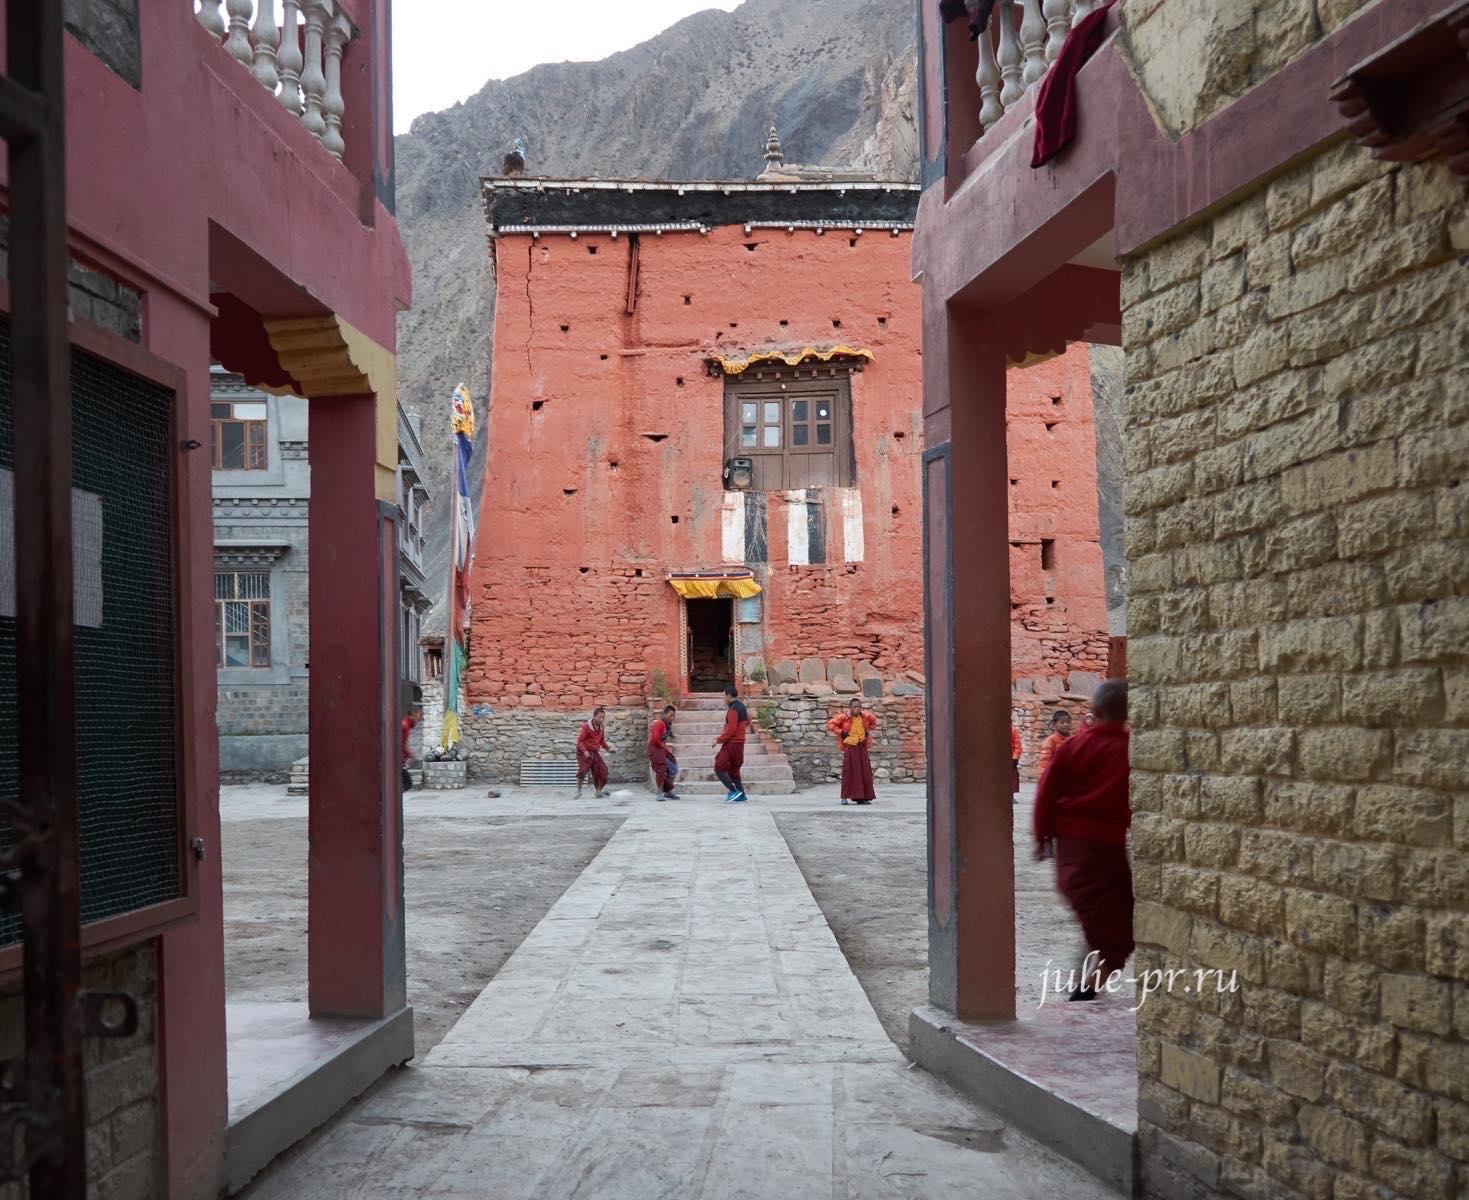 Непал, Трек вокруг Аннапурны, Кагбени, монастырь Каг-Чоде-Туптен-Сампхел-Линг